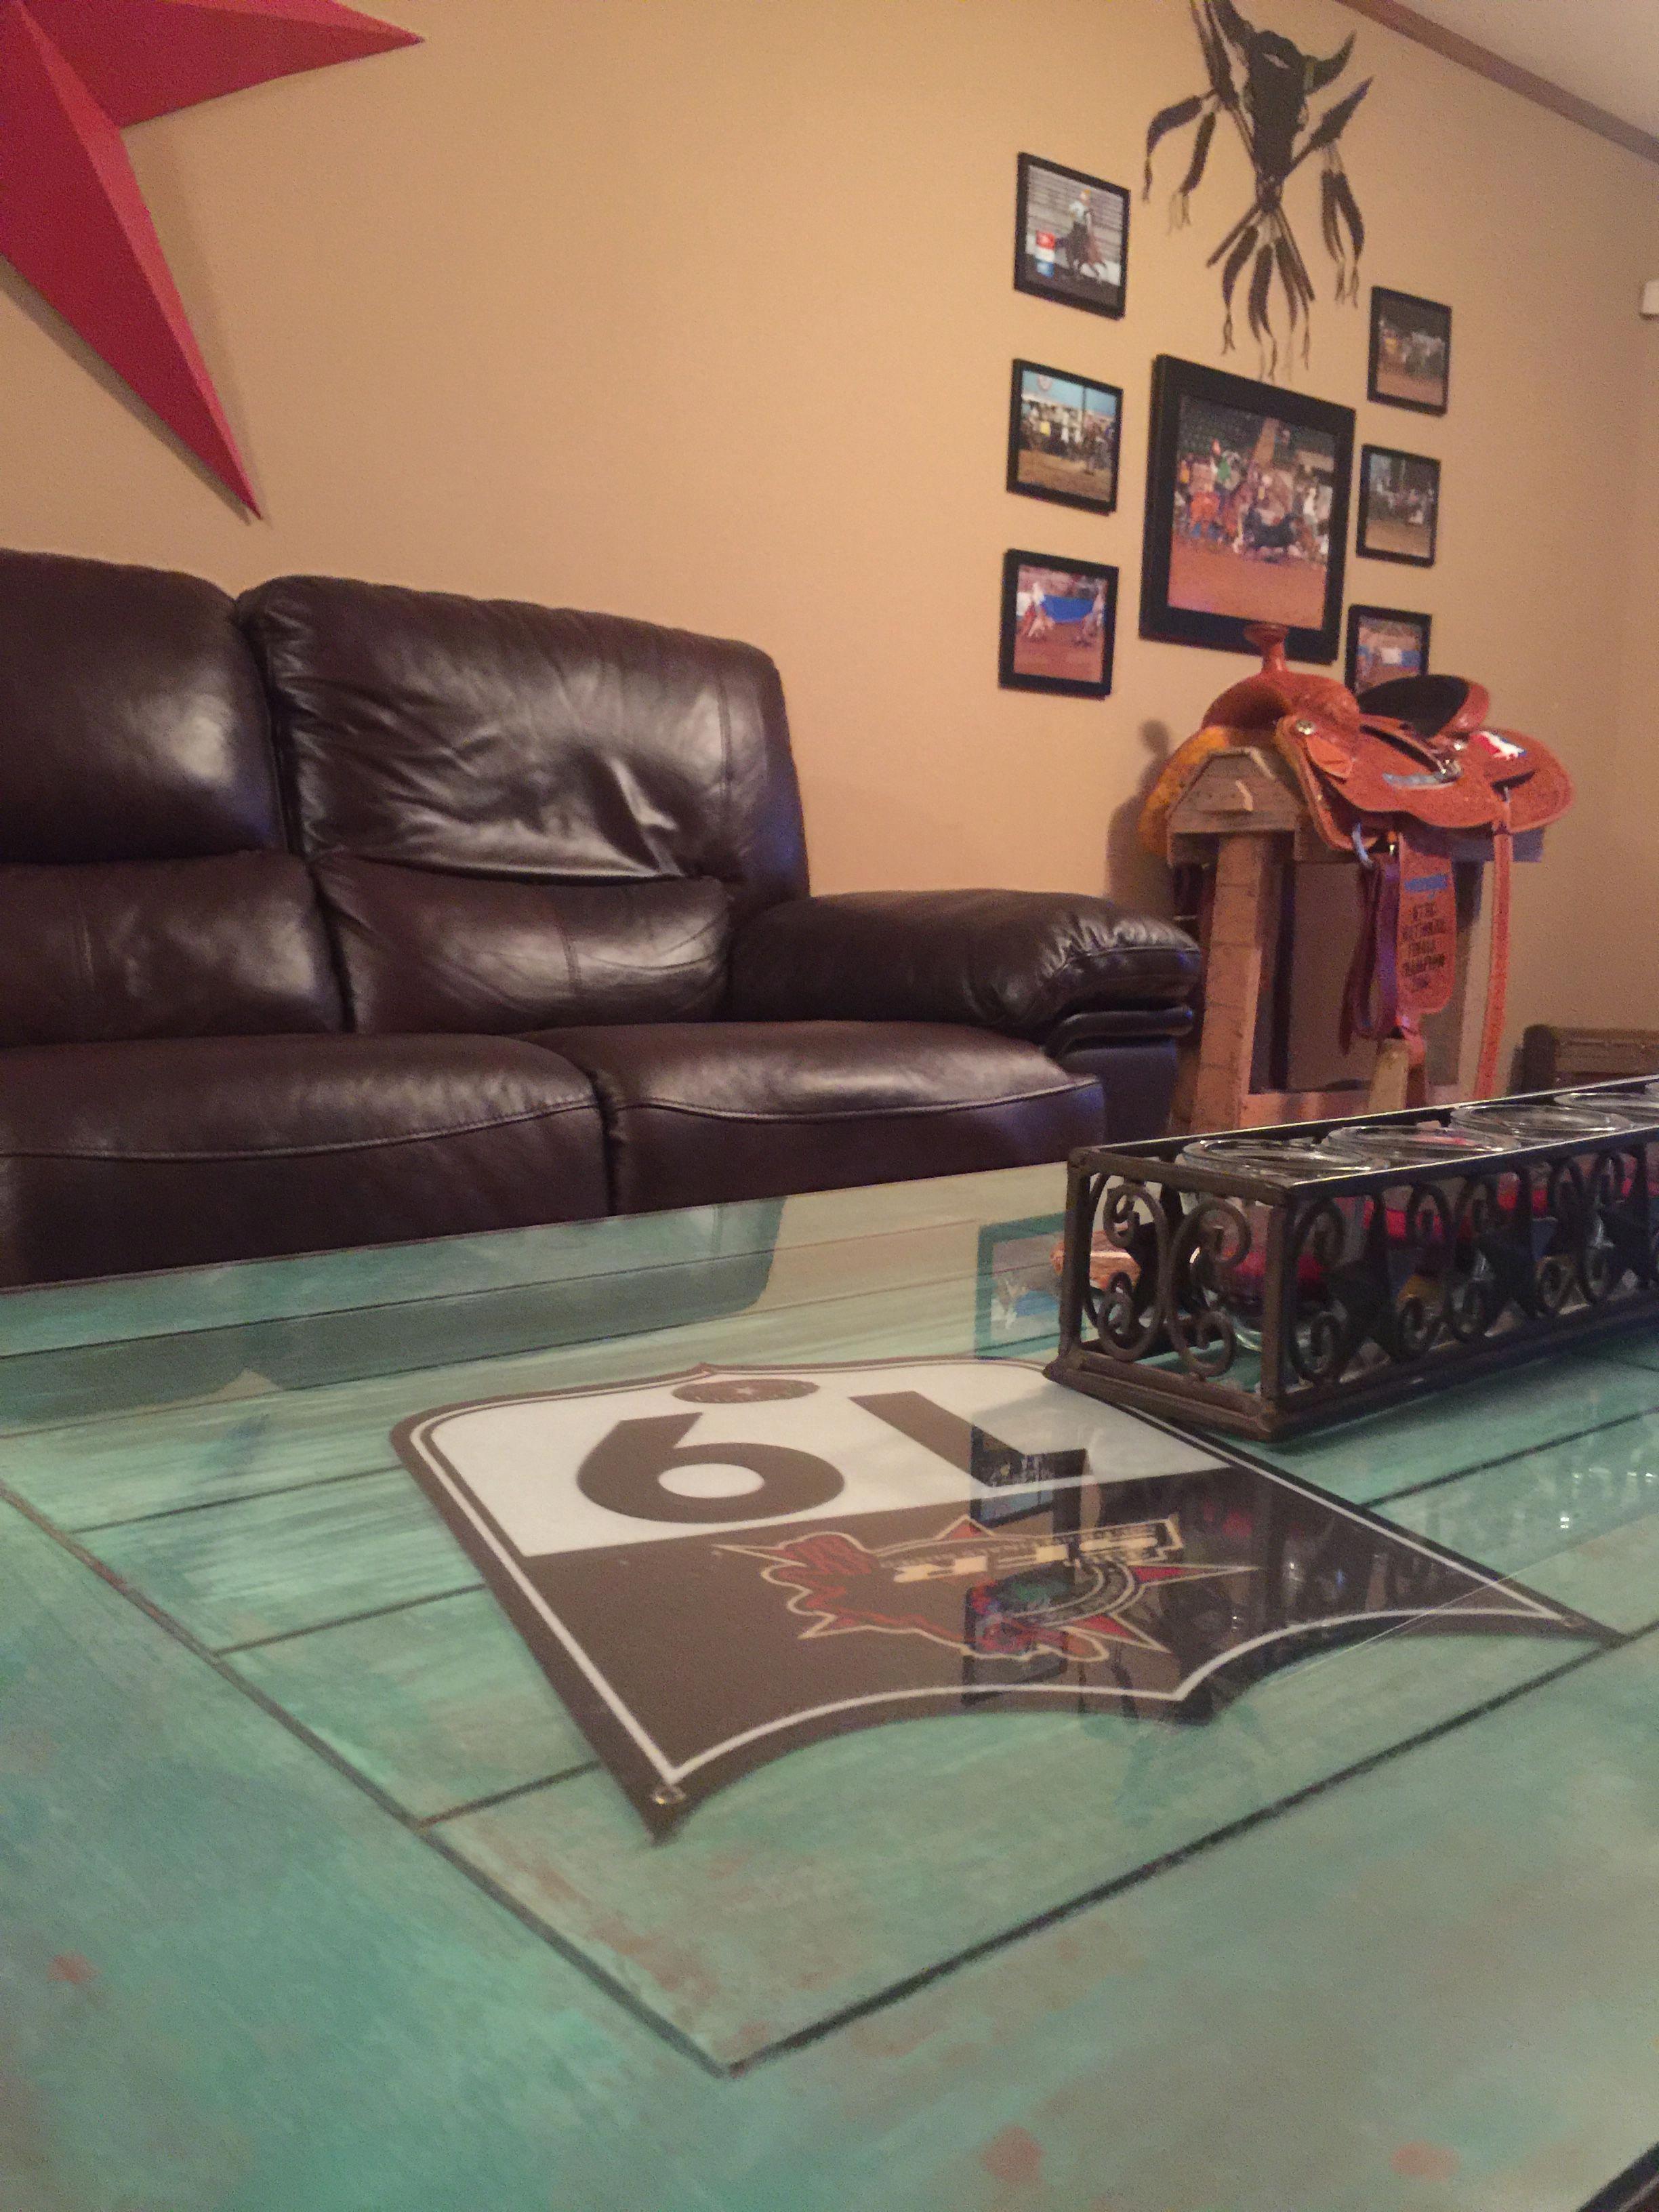 Living Room Interior Design Pdf: Food Safety Tips Pdf #FoodTipsForHealthyBody